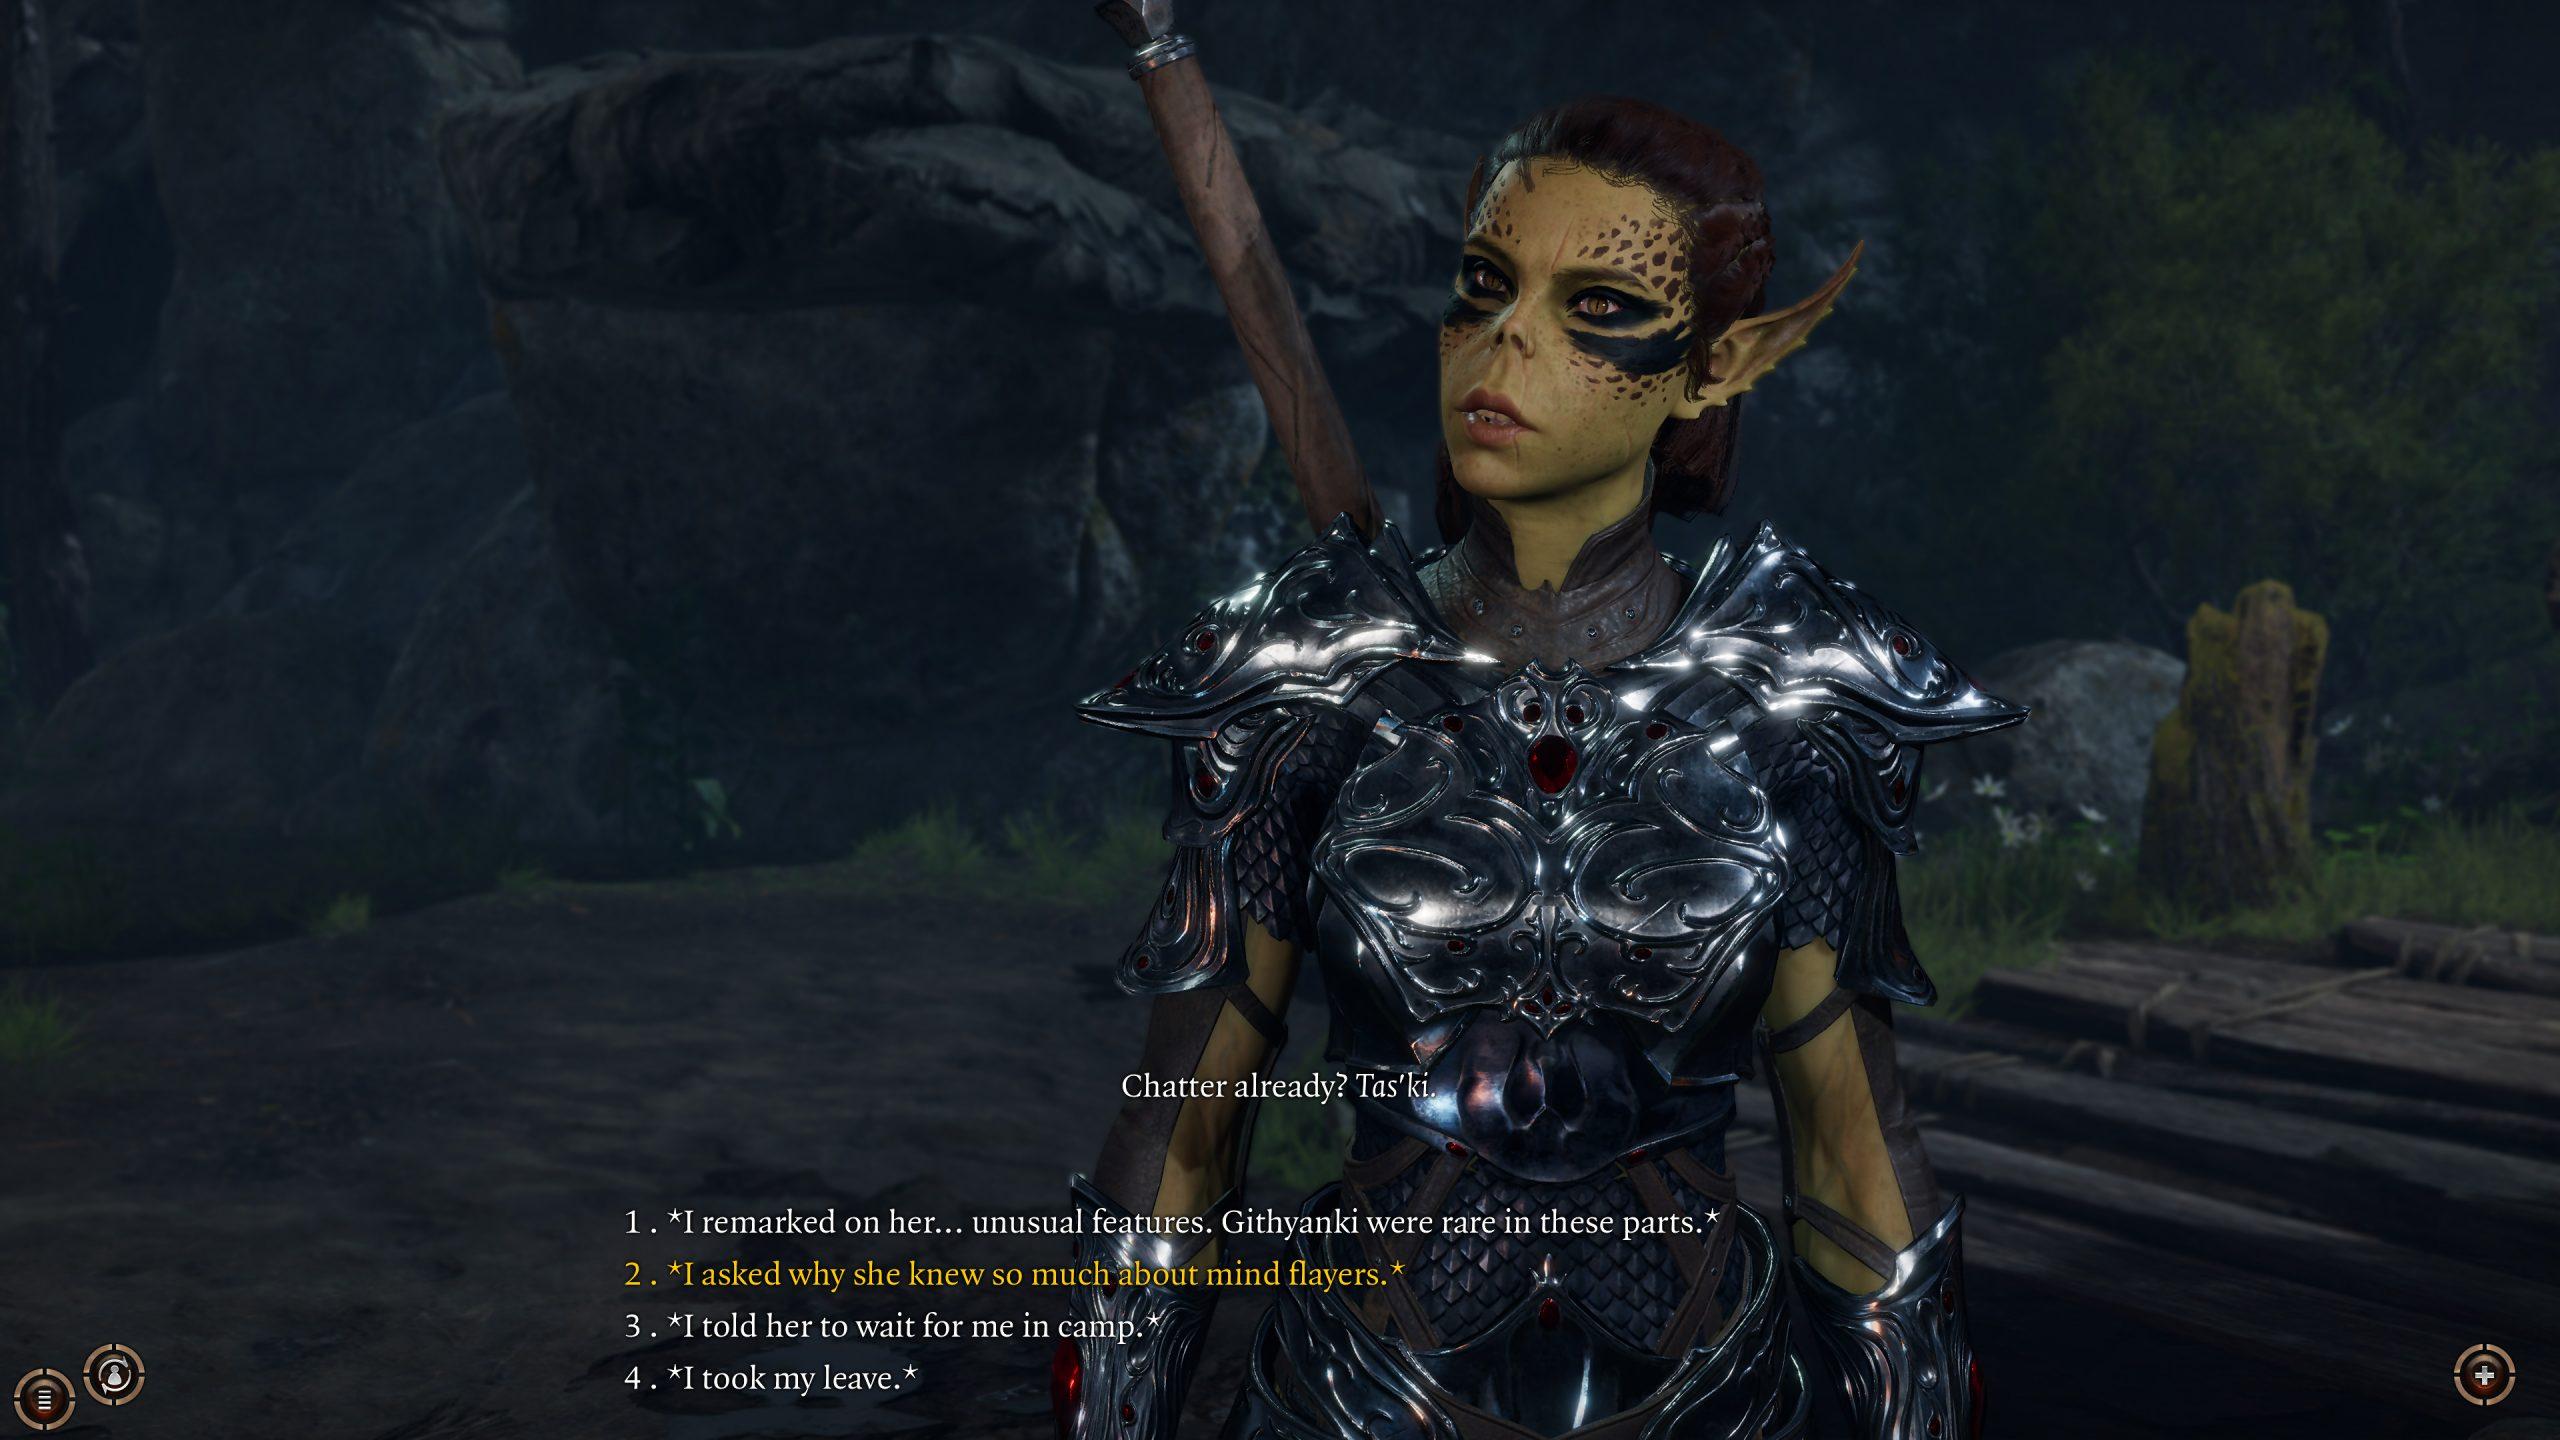 Утечка: скриншоты Baldur's Gate III 3